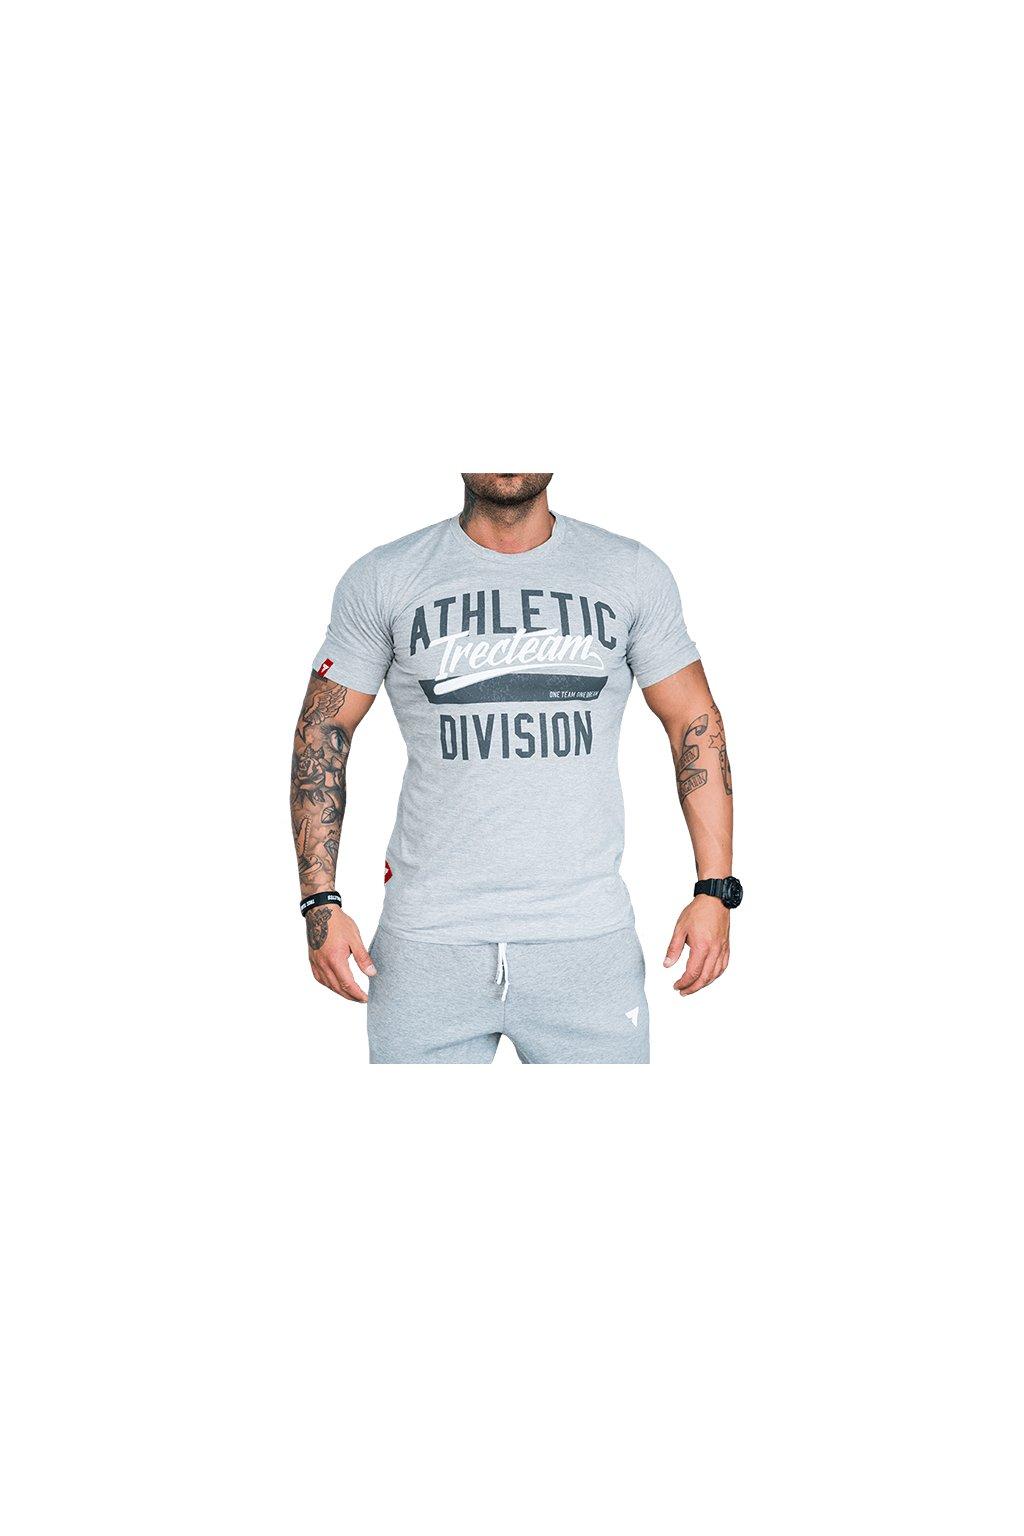 t shirt tta 005 001